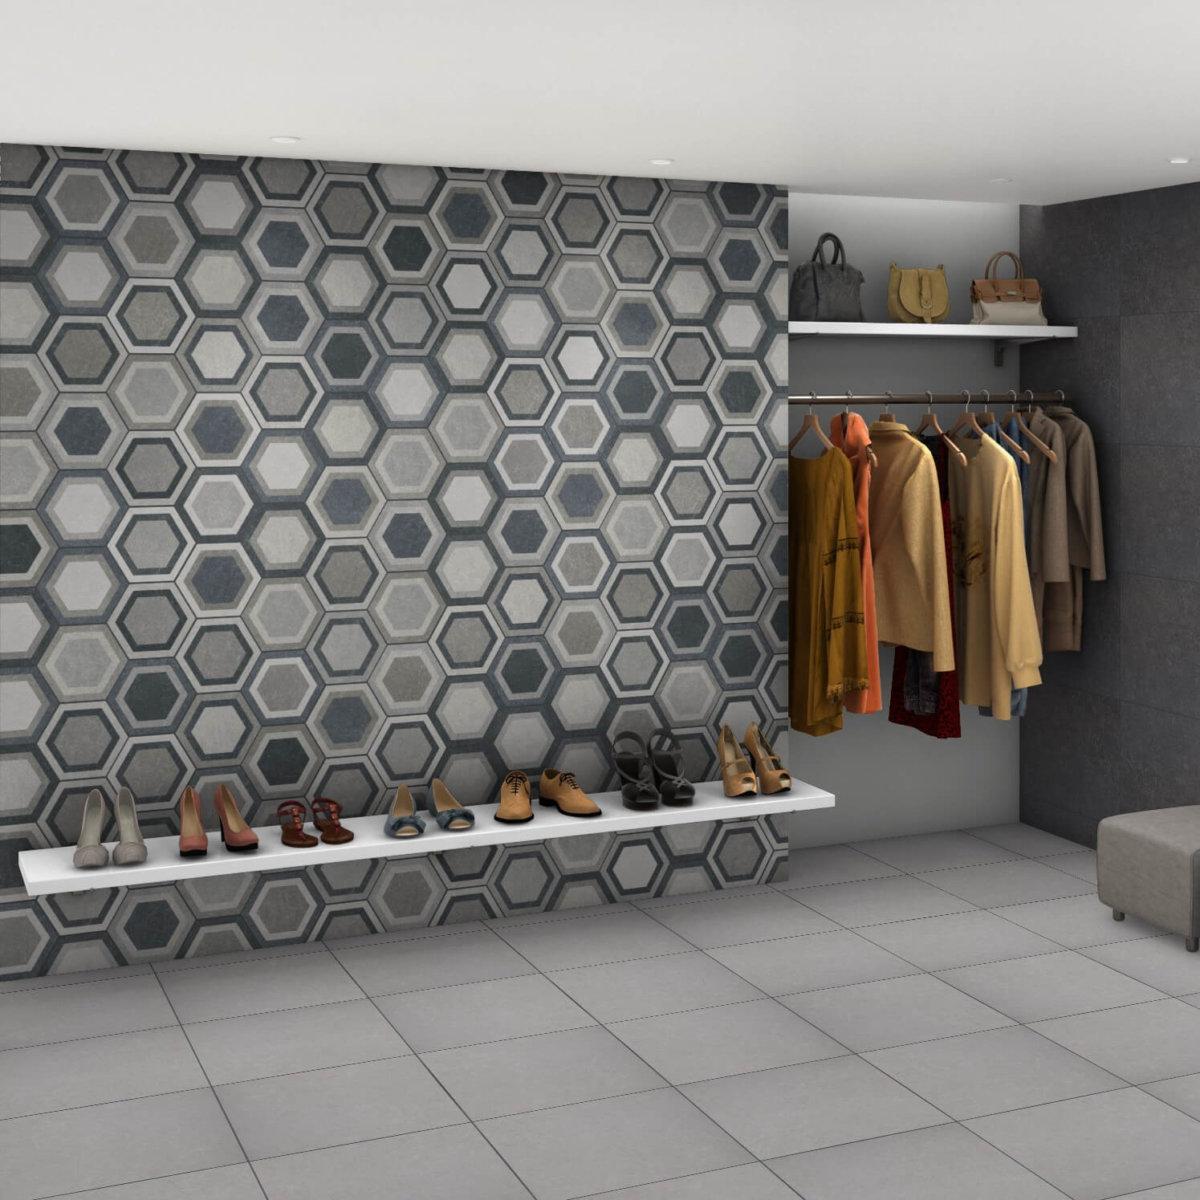 Codicer Hexagon Traffic Combi Grey 220x250mm_Stiles_Lifestyle2_Image